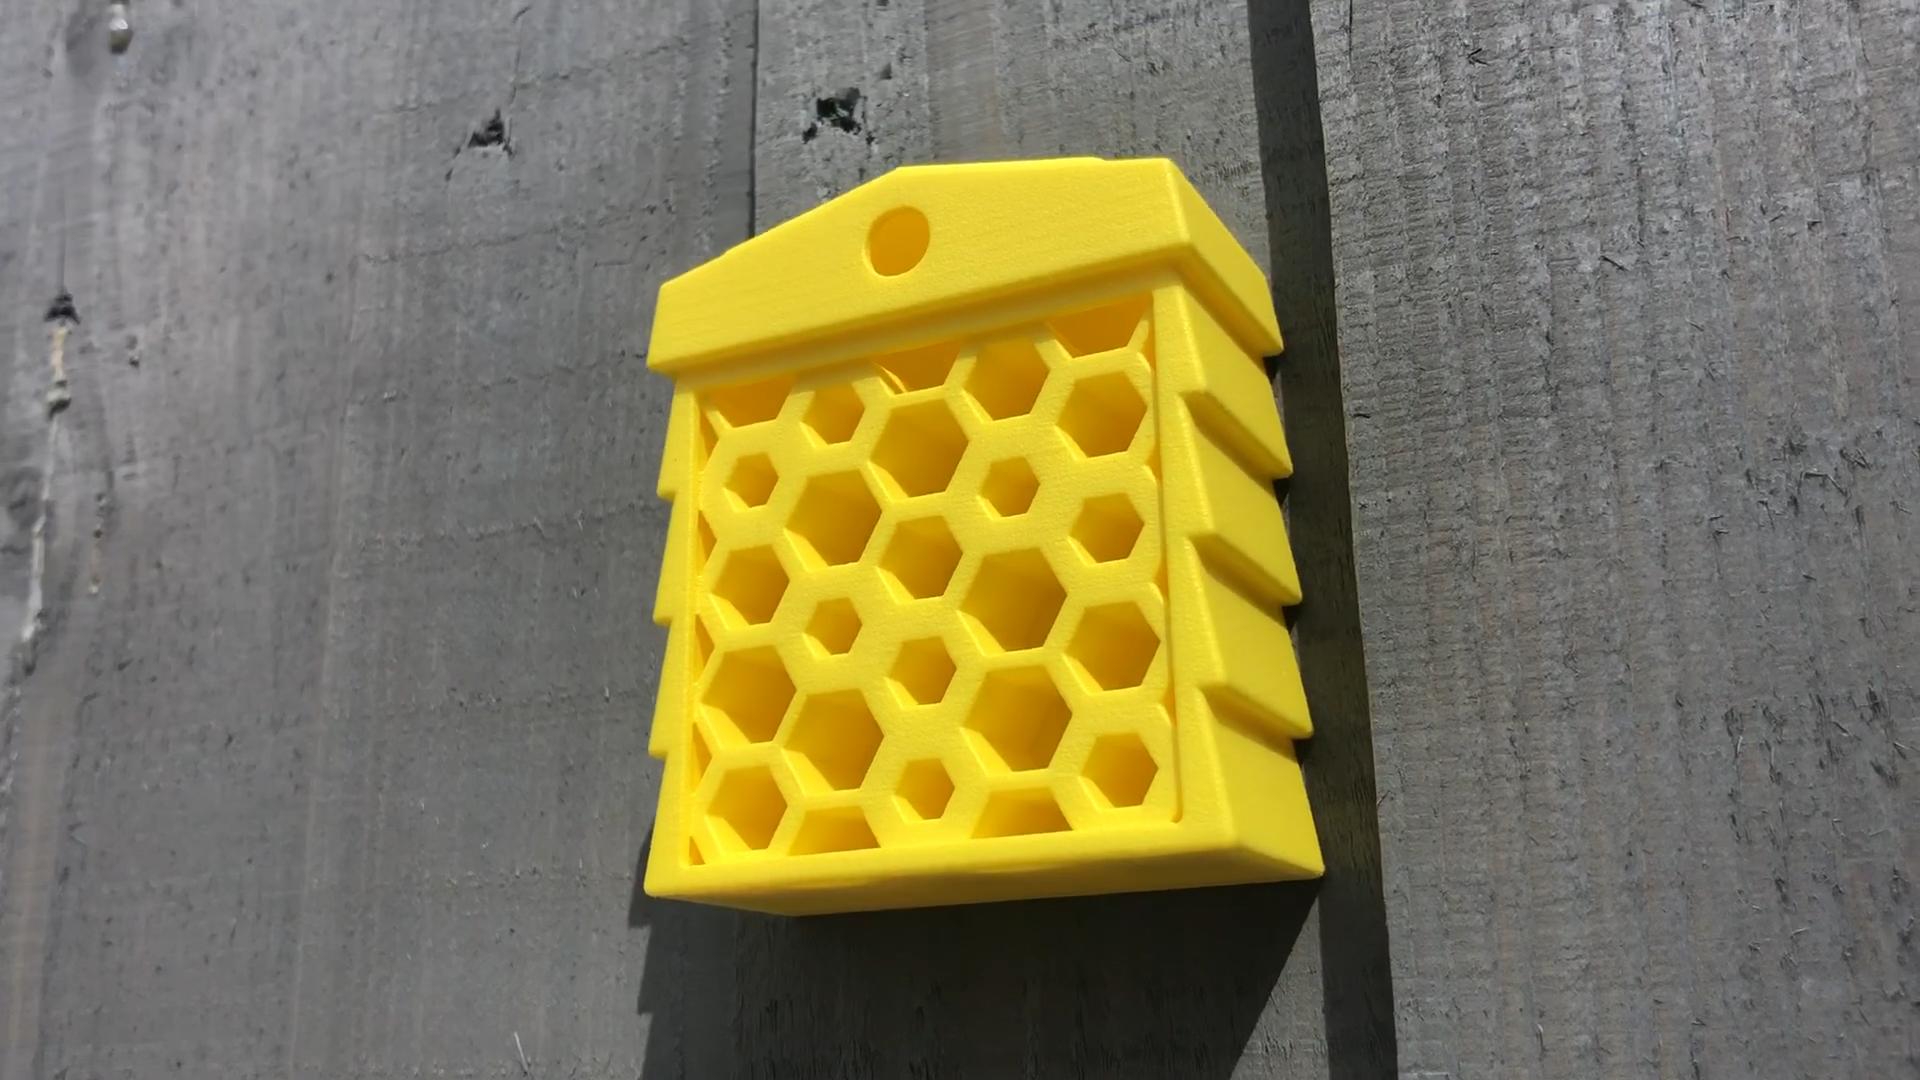 Foto des fertiggestellten, 3D-gedruckten Bienenstocks